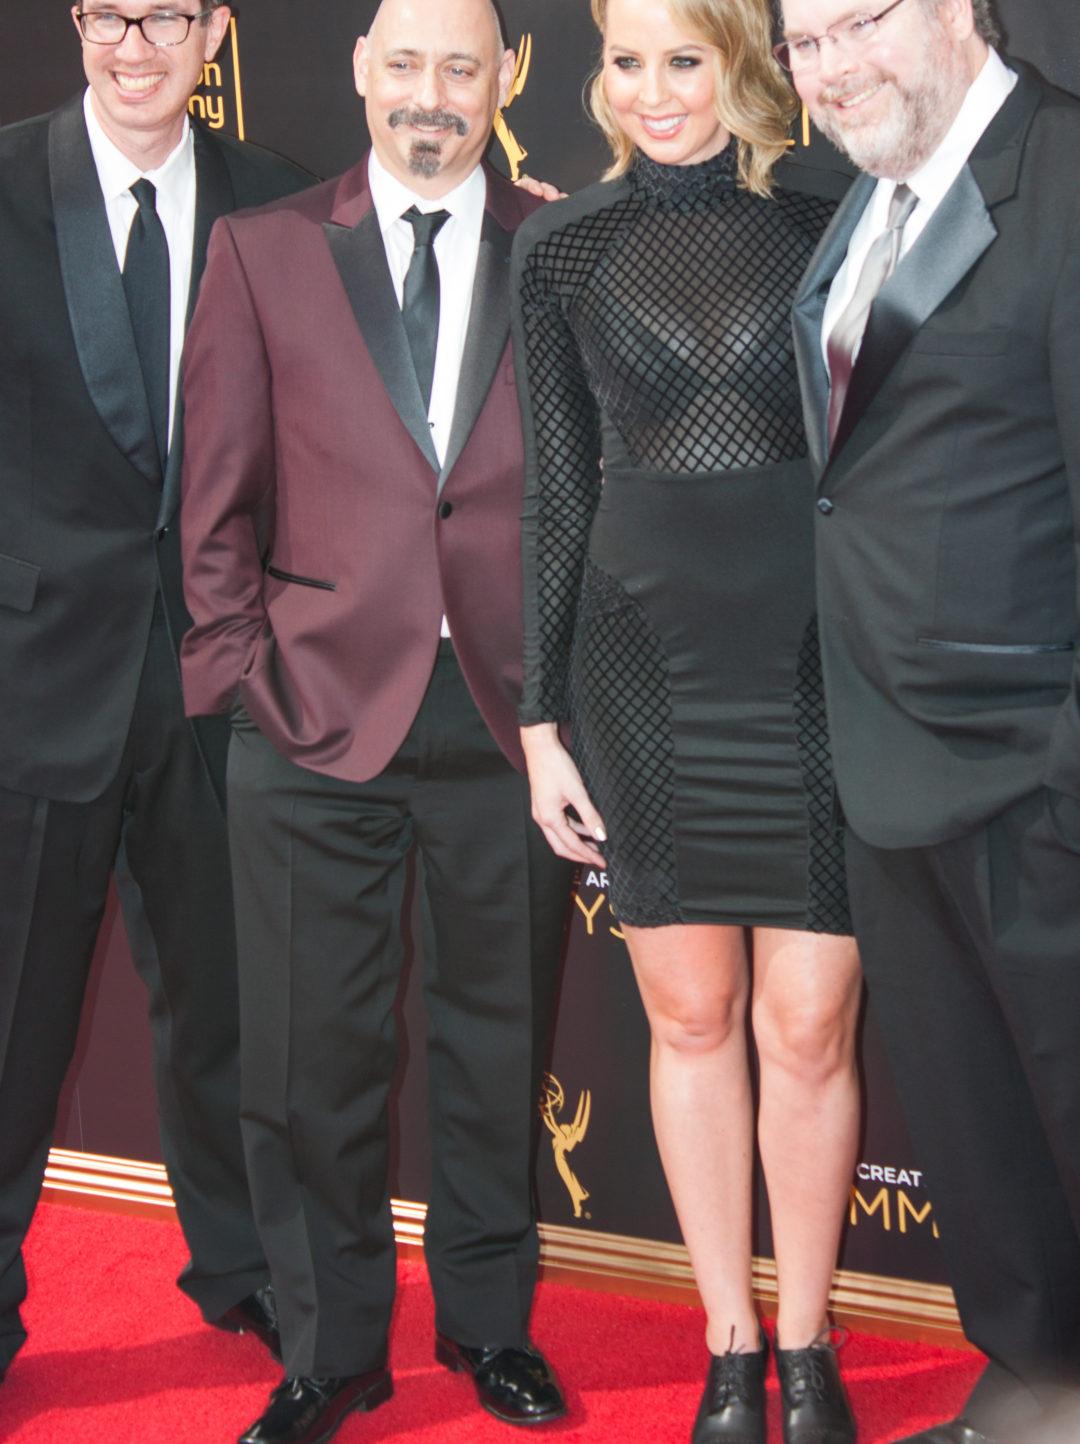 Mike Fasolo (writer), Tom Root (writer), Matthew Senreich (creator), and Deirdre Devlin (writer) Emmy's Creative Arts 2016 Red Carpet 4Chion Lifestyle